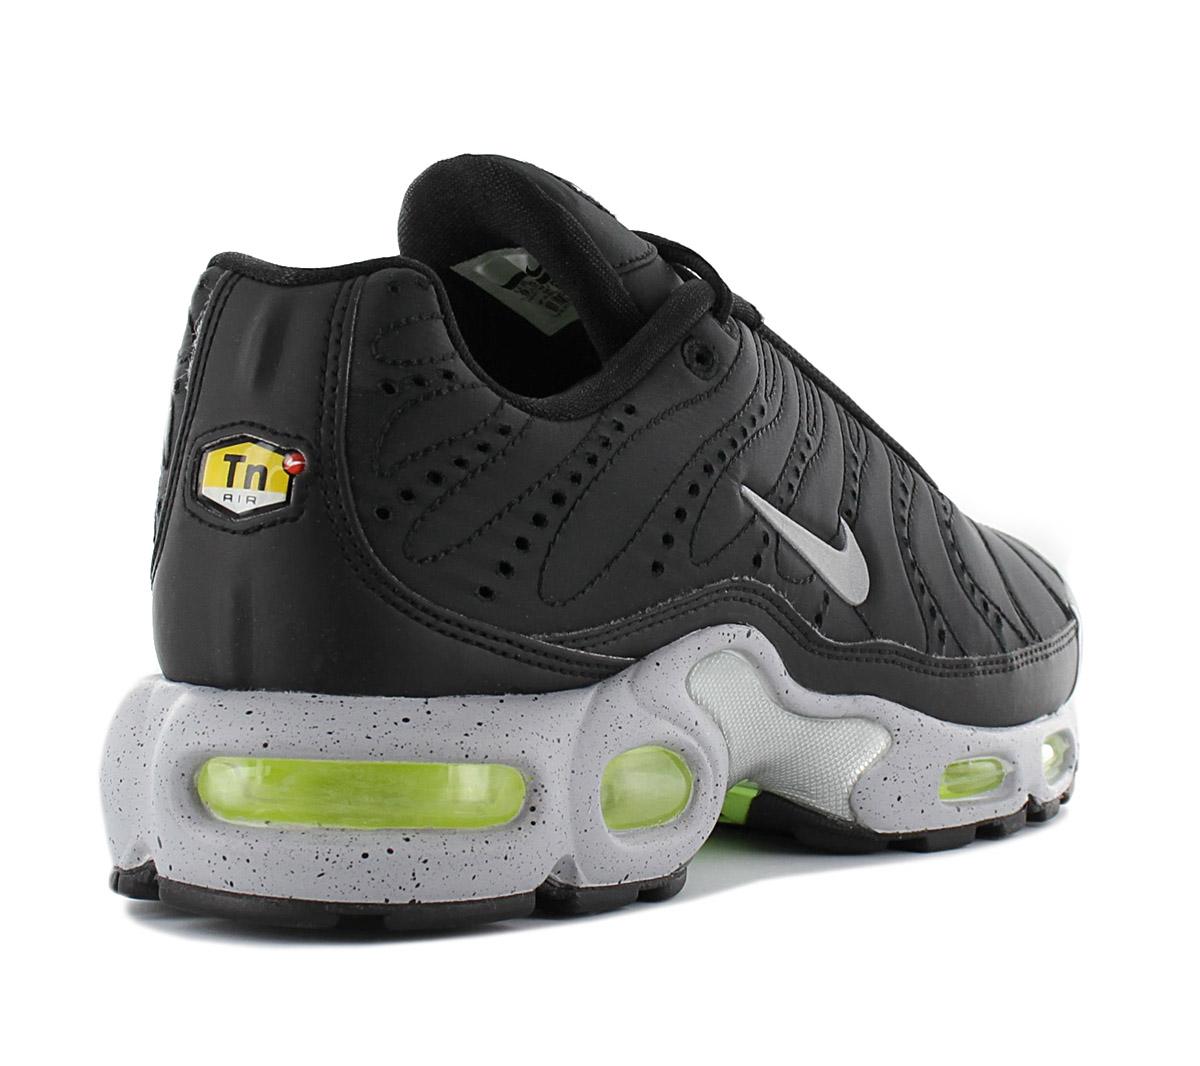 Nike Air Max Plus TN Premium 815994 003 Herren Schuhe Schwarz , Größe: EU 43 US 9.5